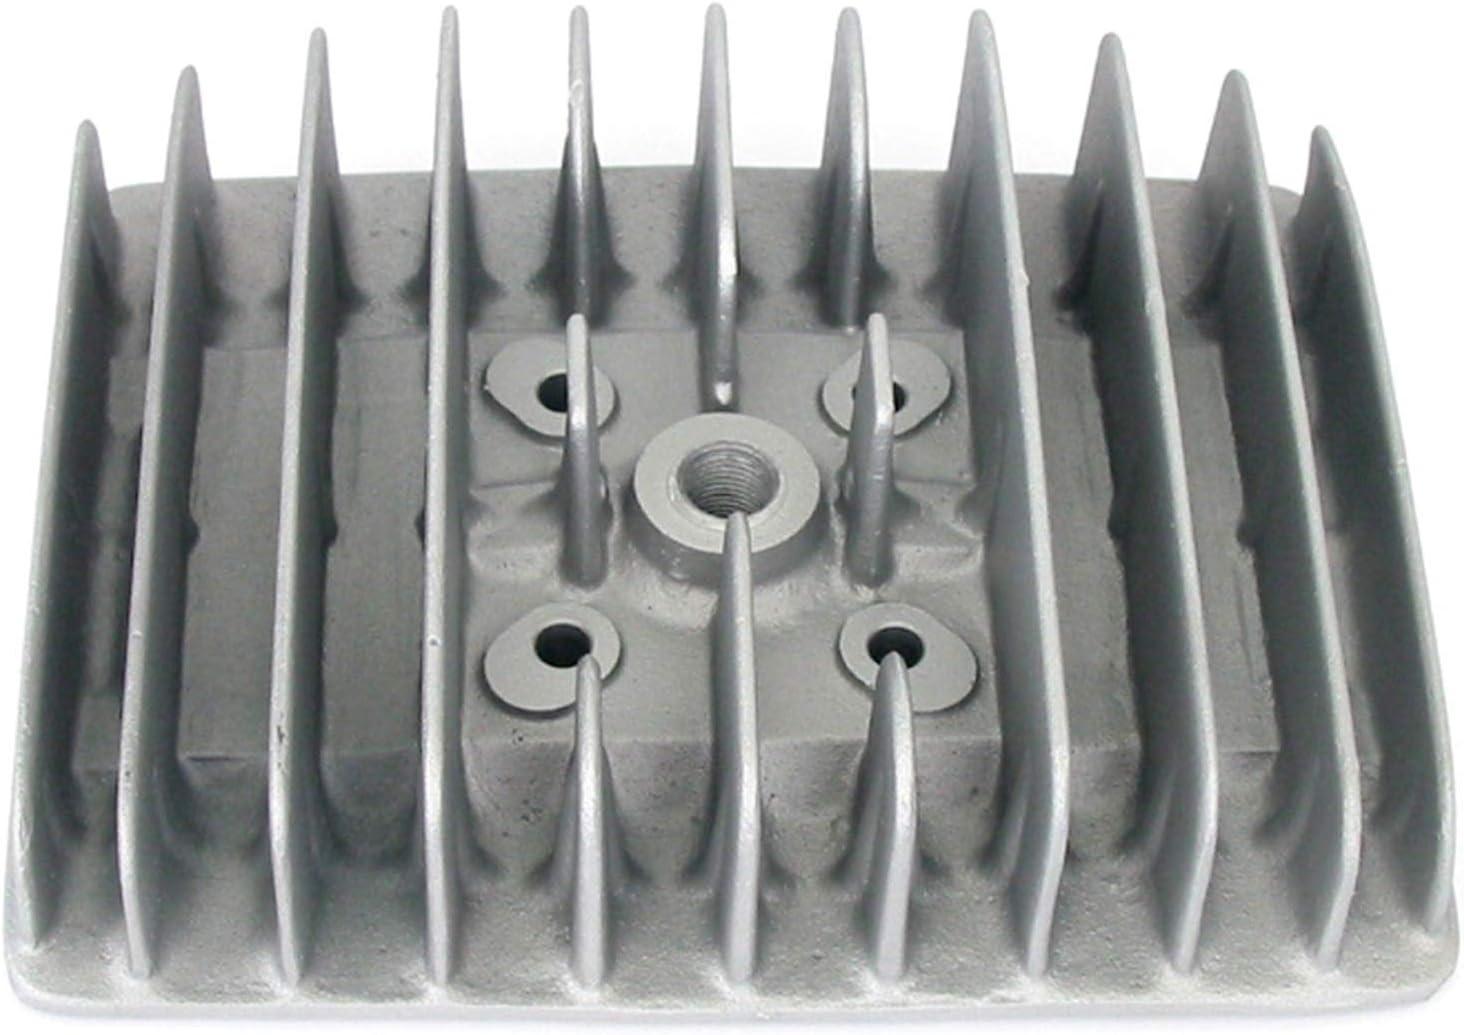 Zylinderkopf f/ür ATHENA Tuningzylinder Z/ÜNDAPP KS 50 und Mofas//Mokicks 70ccm 45 mm